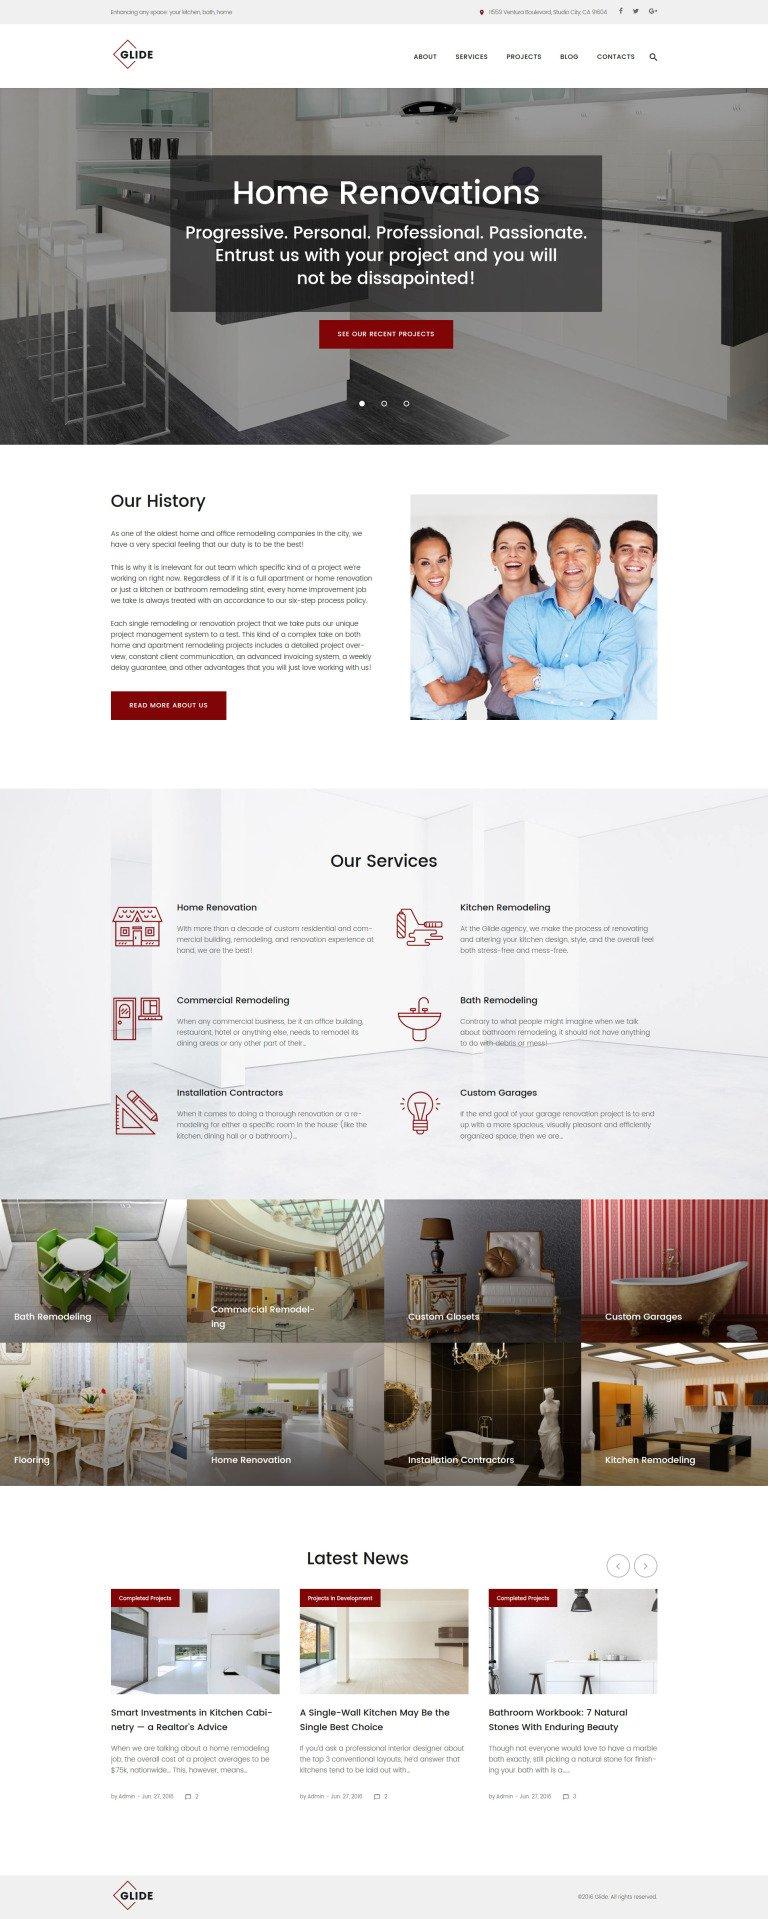 Glide - Home, Bath and Kitchen Renovation Company WordPress Theme New Screenshots BIG